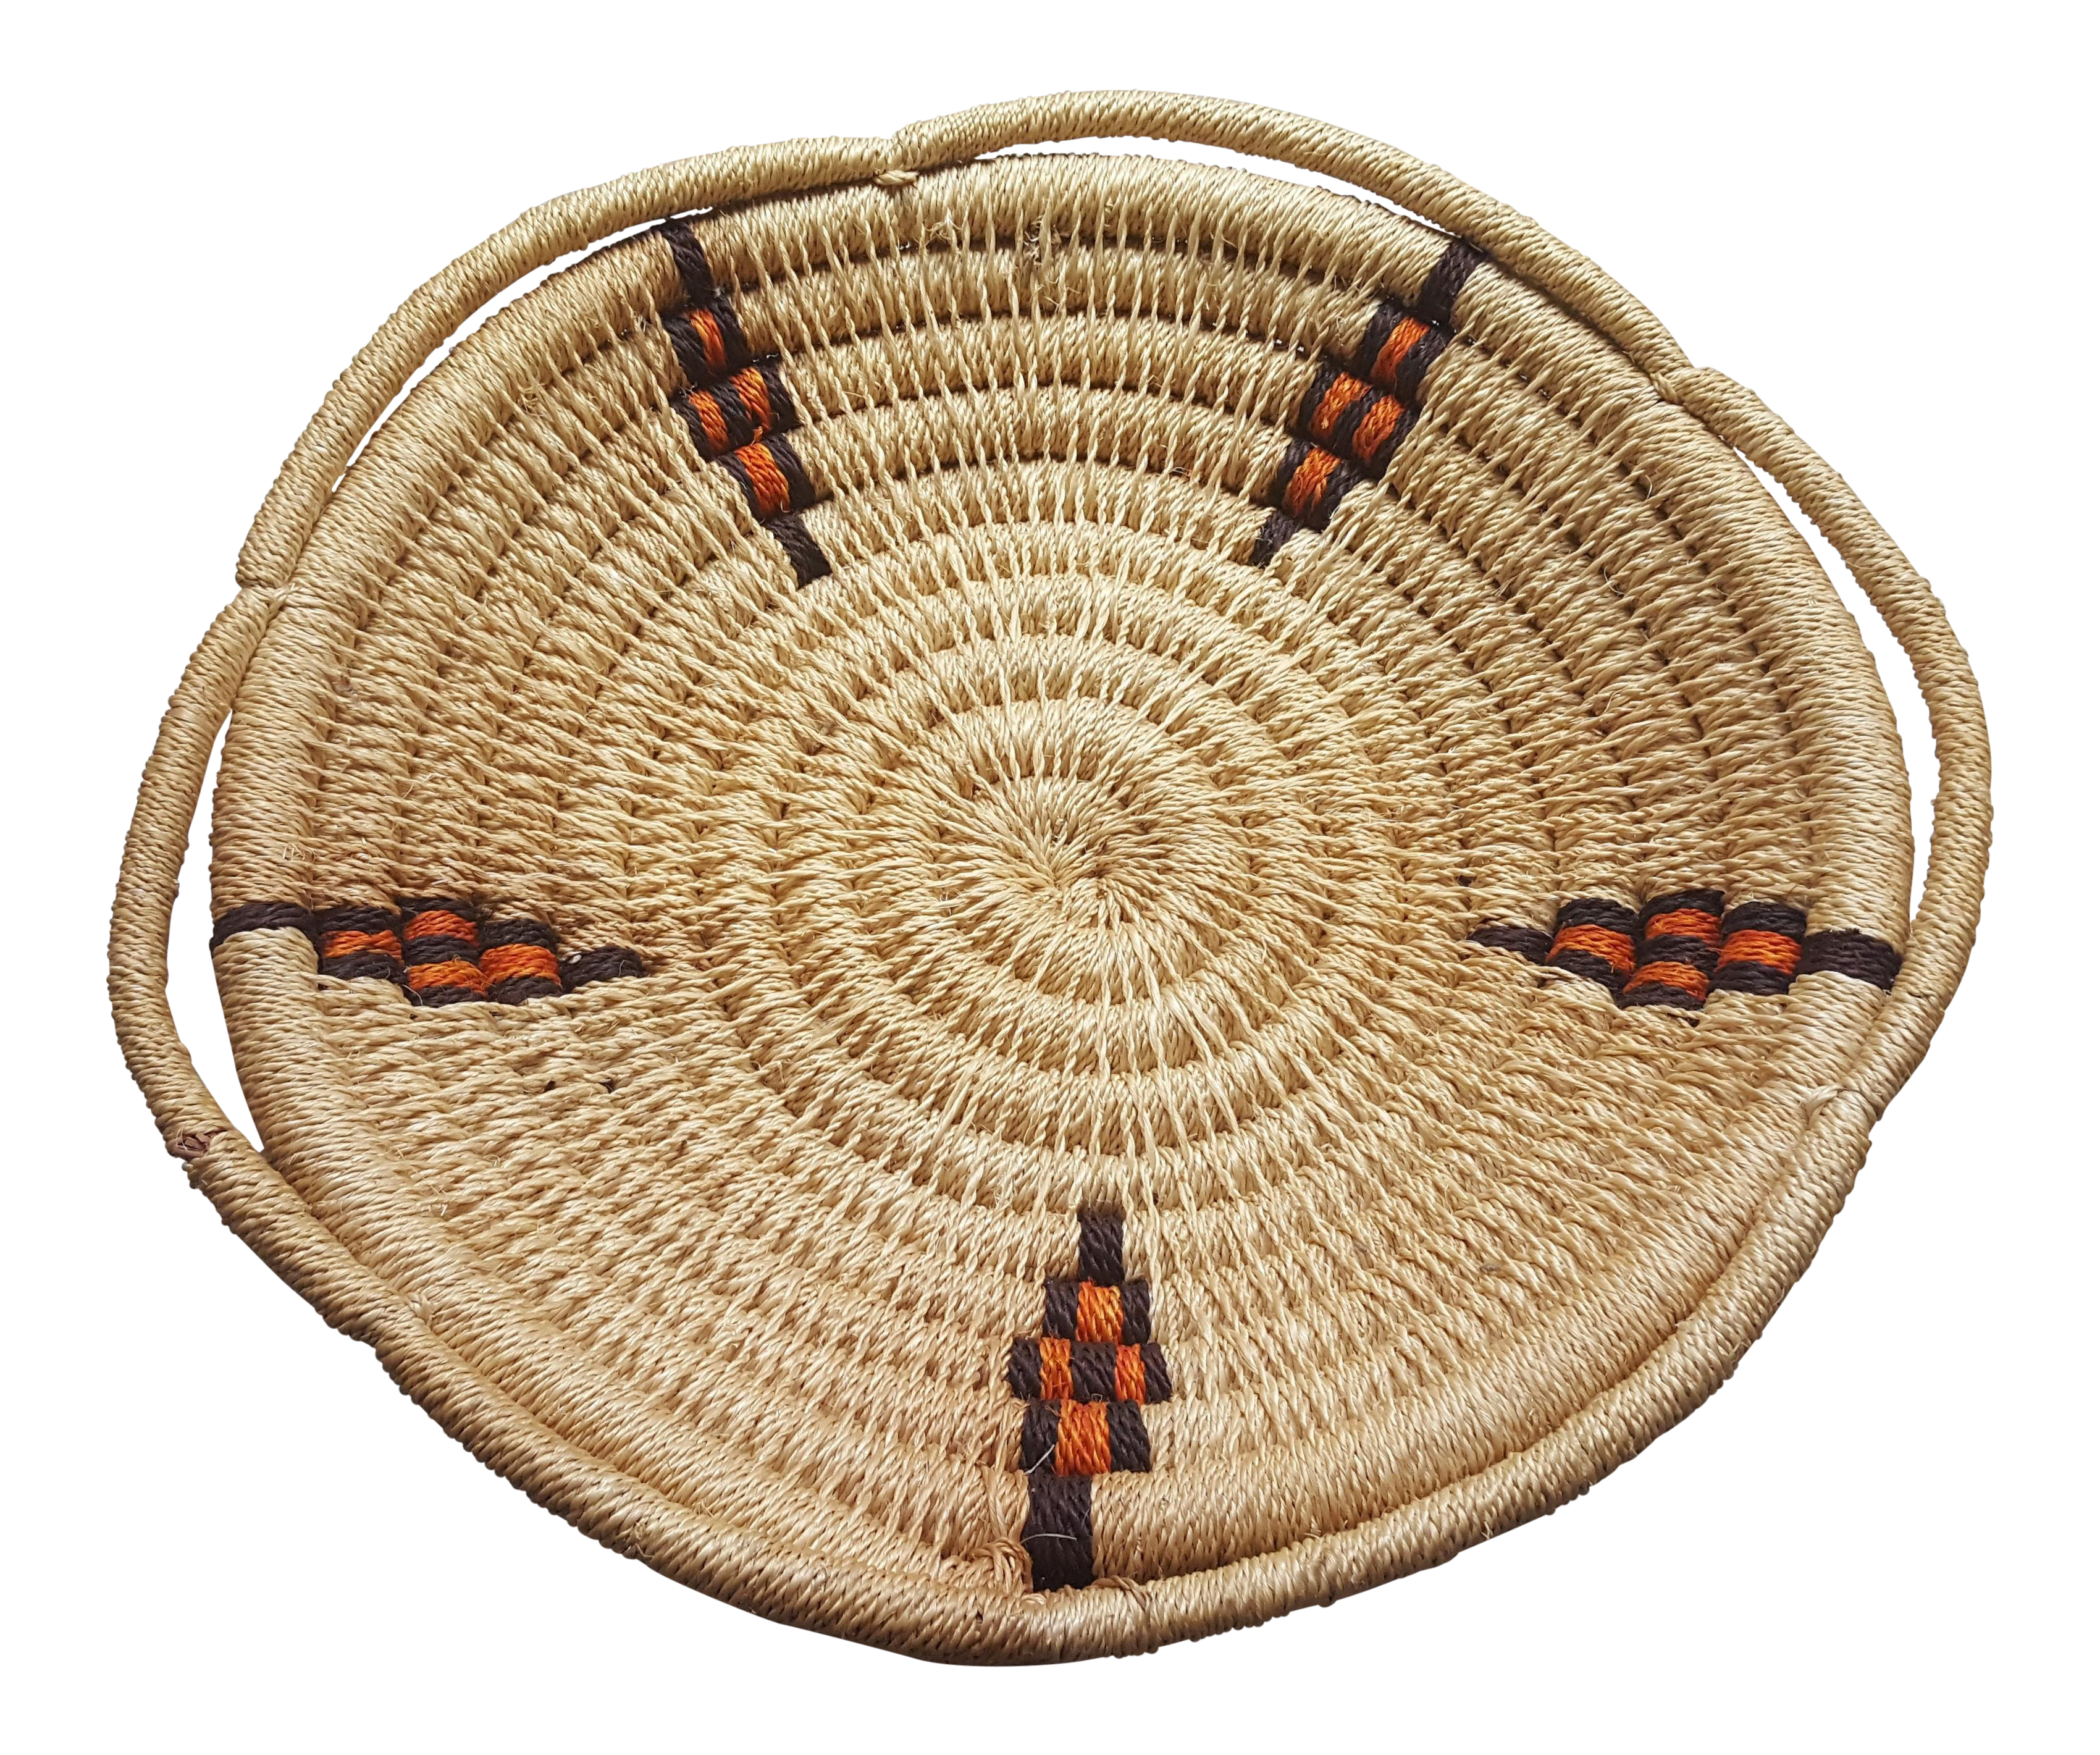 Vintage Woven Basket Tray   Chairish